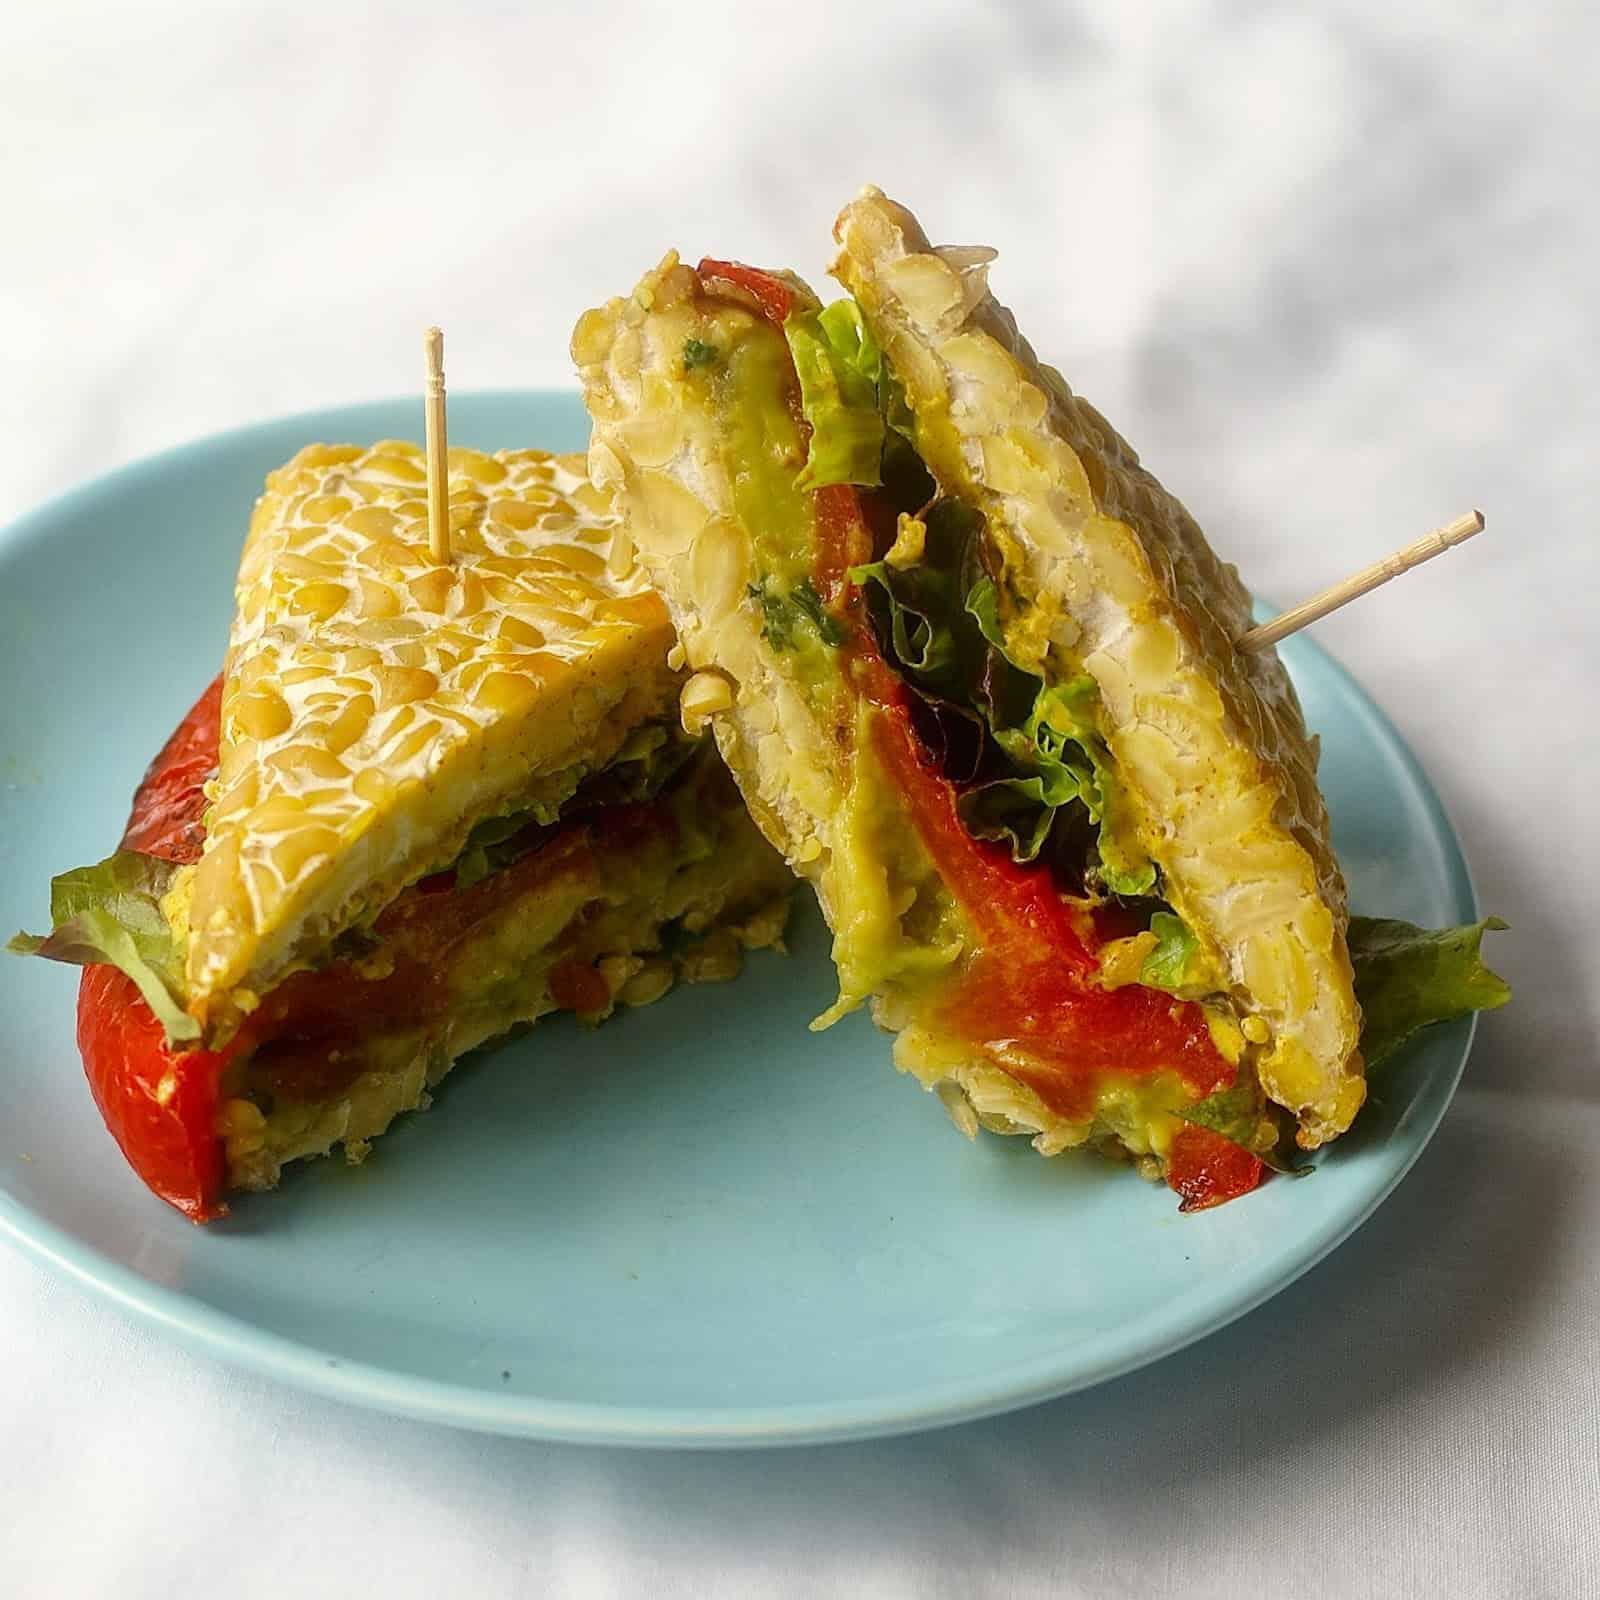 "Tempeh 'Bread"" and My Kitchen Sink Sandwich"